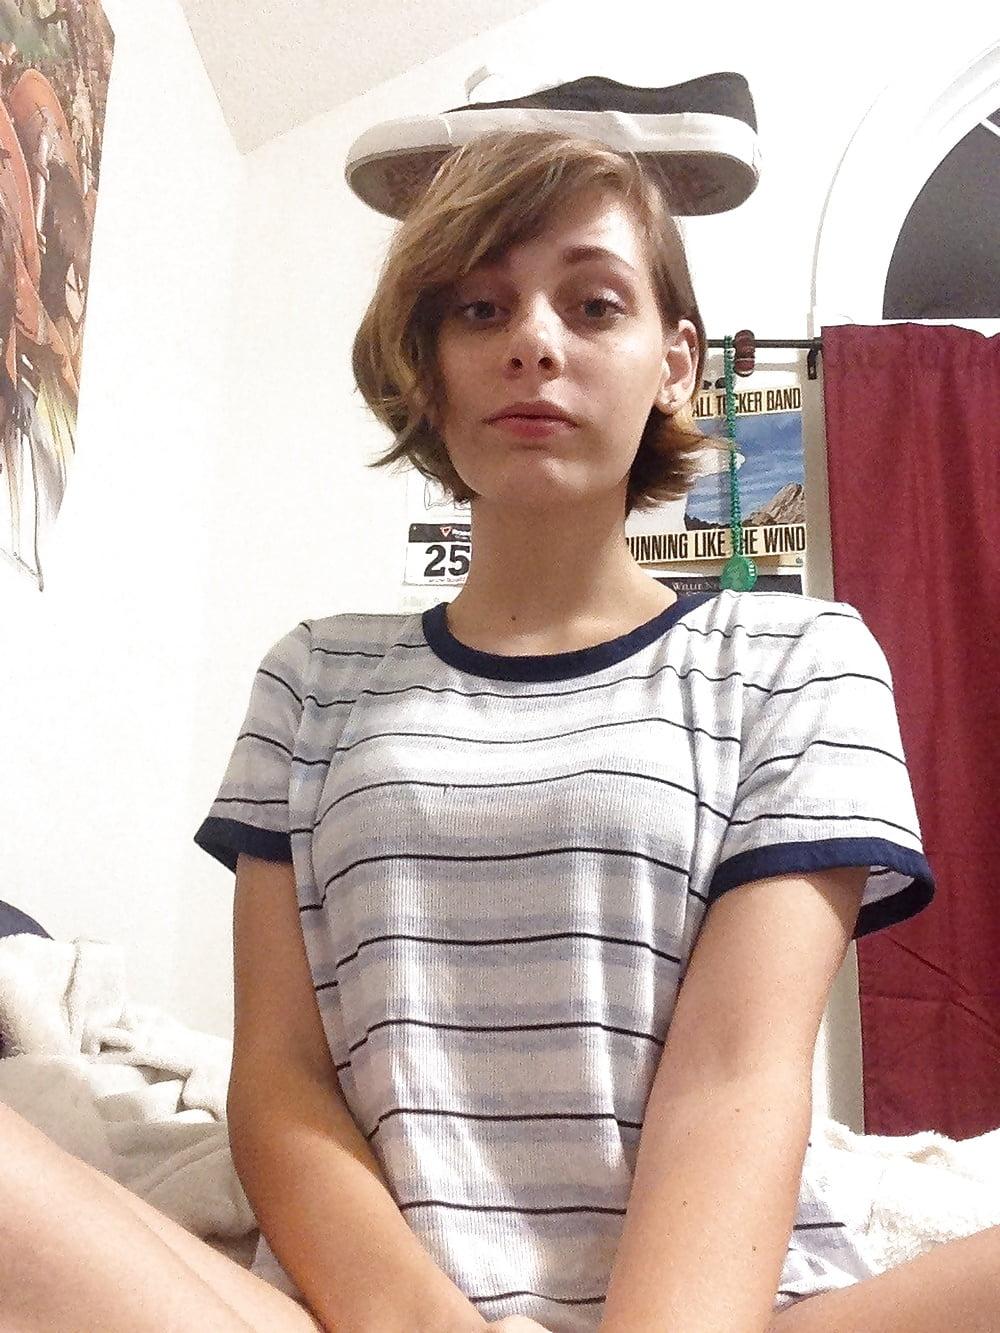 Nerdy Teen Slut Selfies - 57 Pics | xHamster